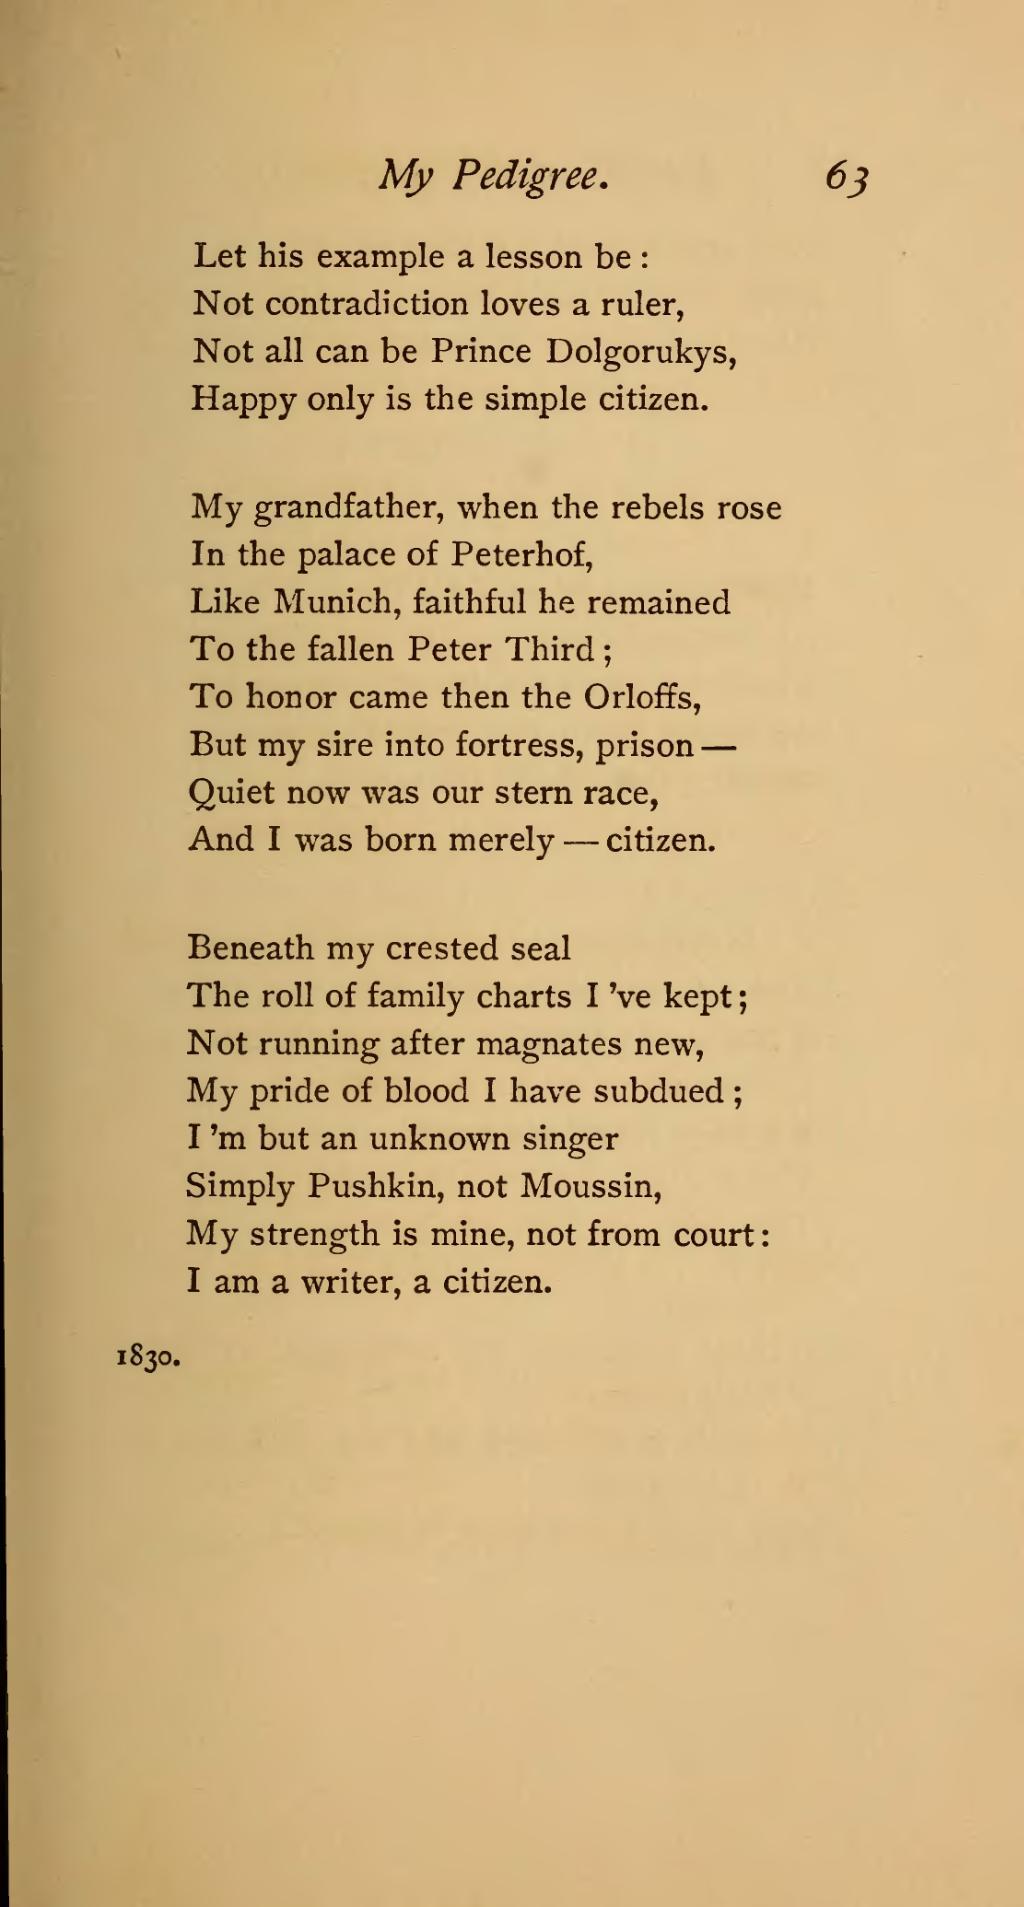 Alexander Pushkin, Prisoner: analysis of the poem 40